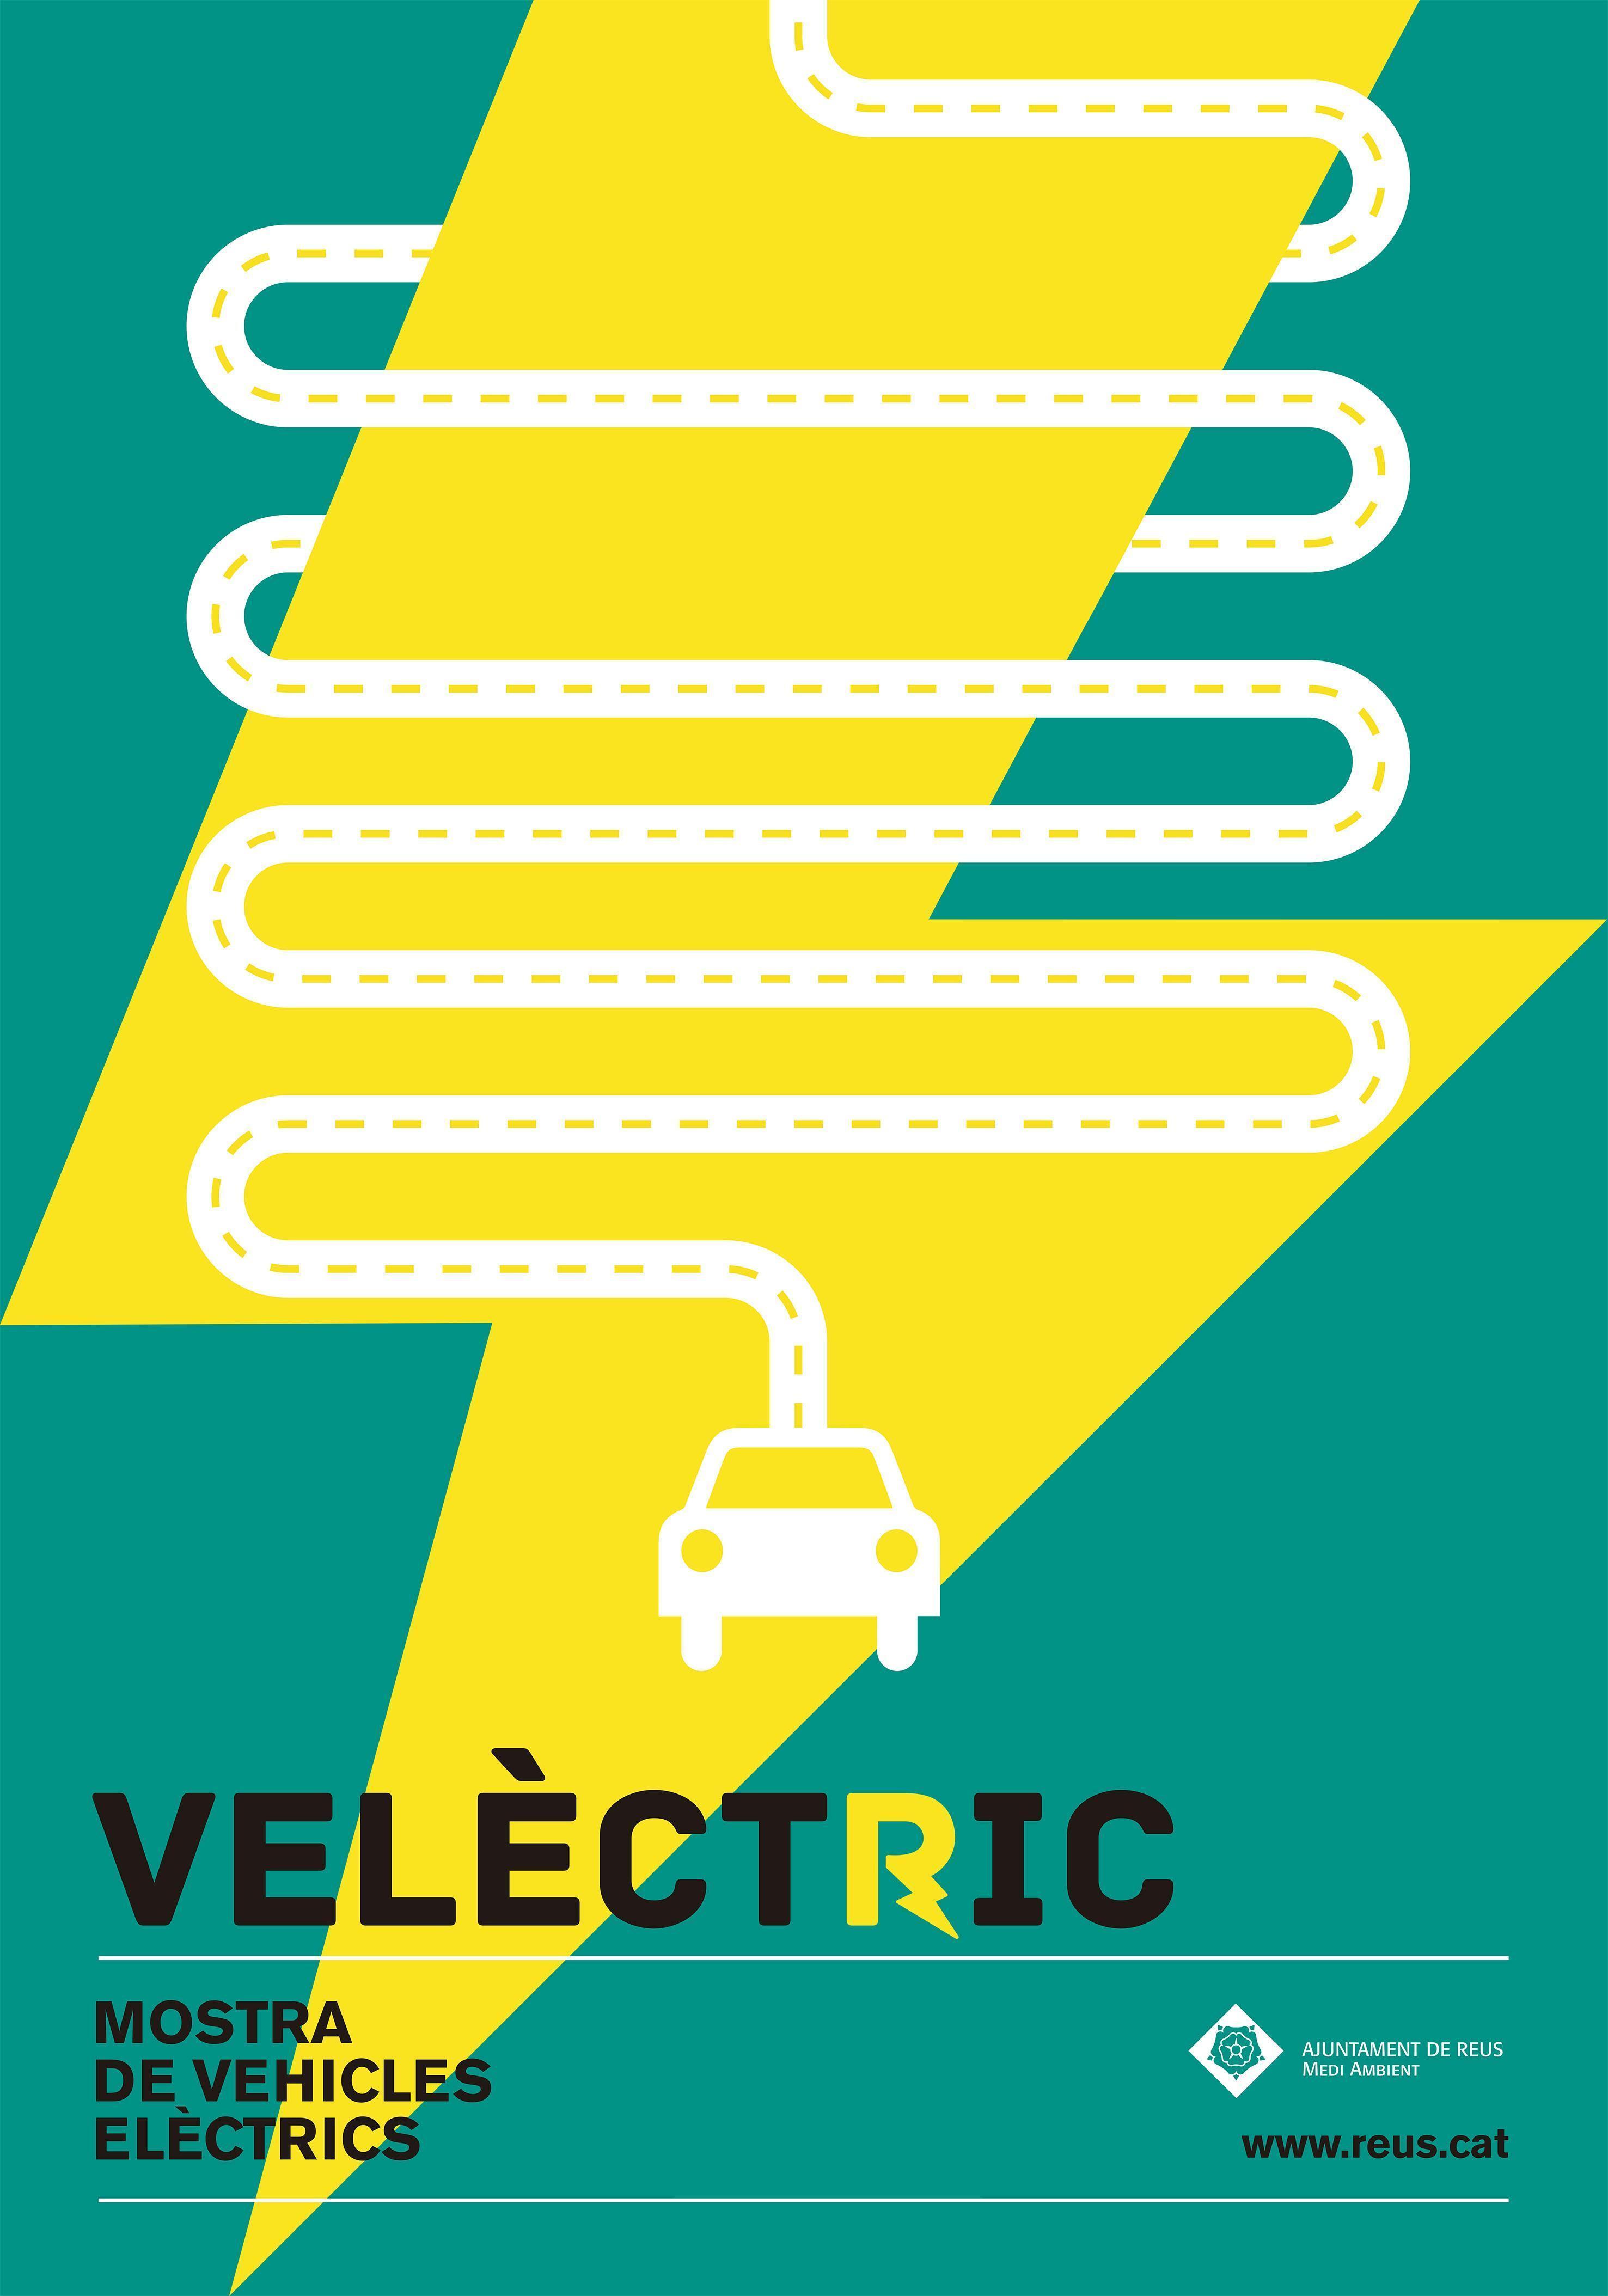 Velèctric 2018. Mostra del vehicle elèctric.